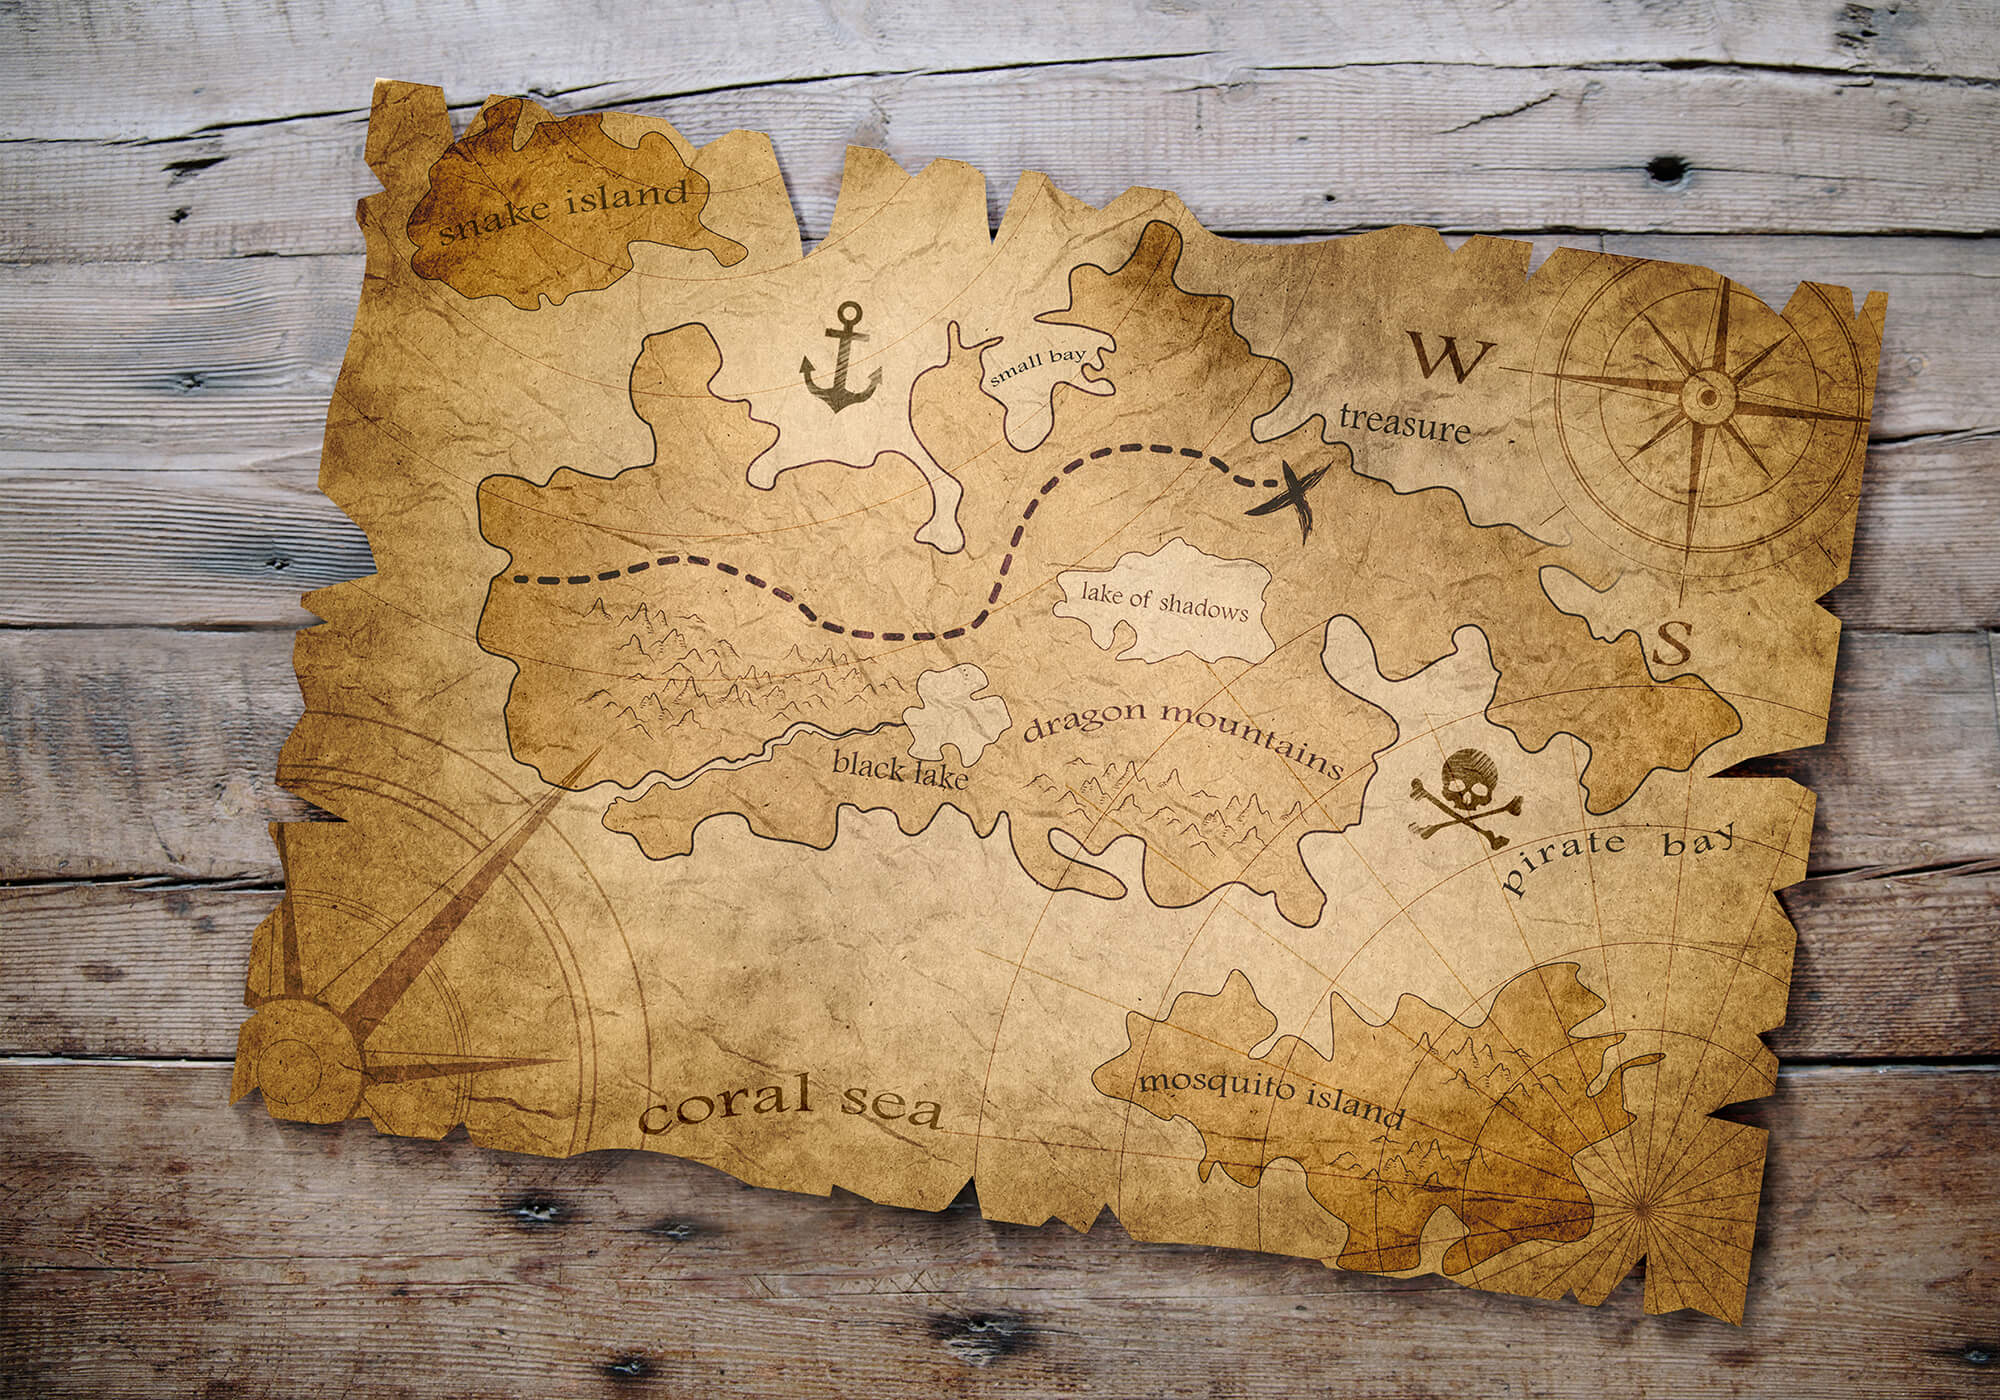 treasure map old tattered on wood table